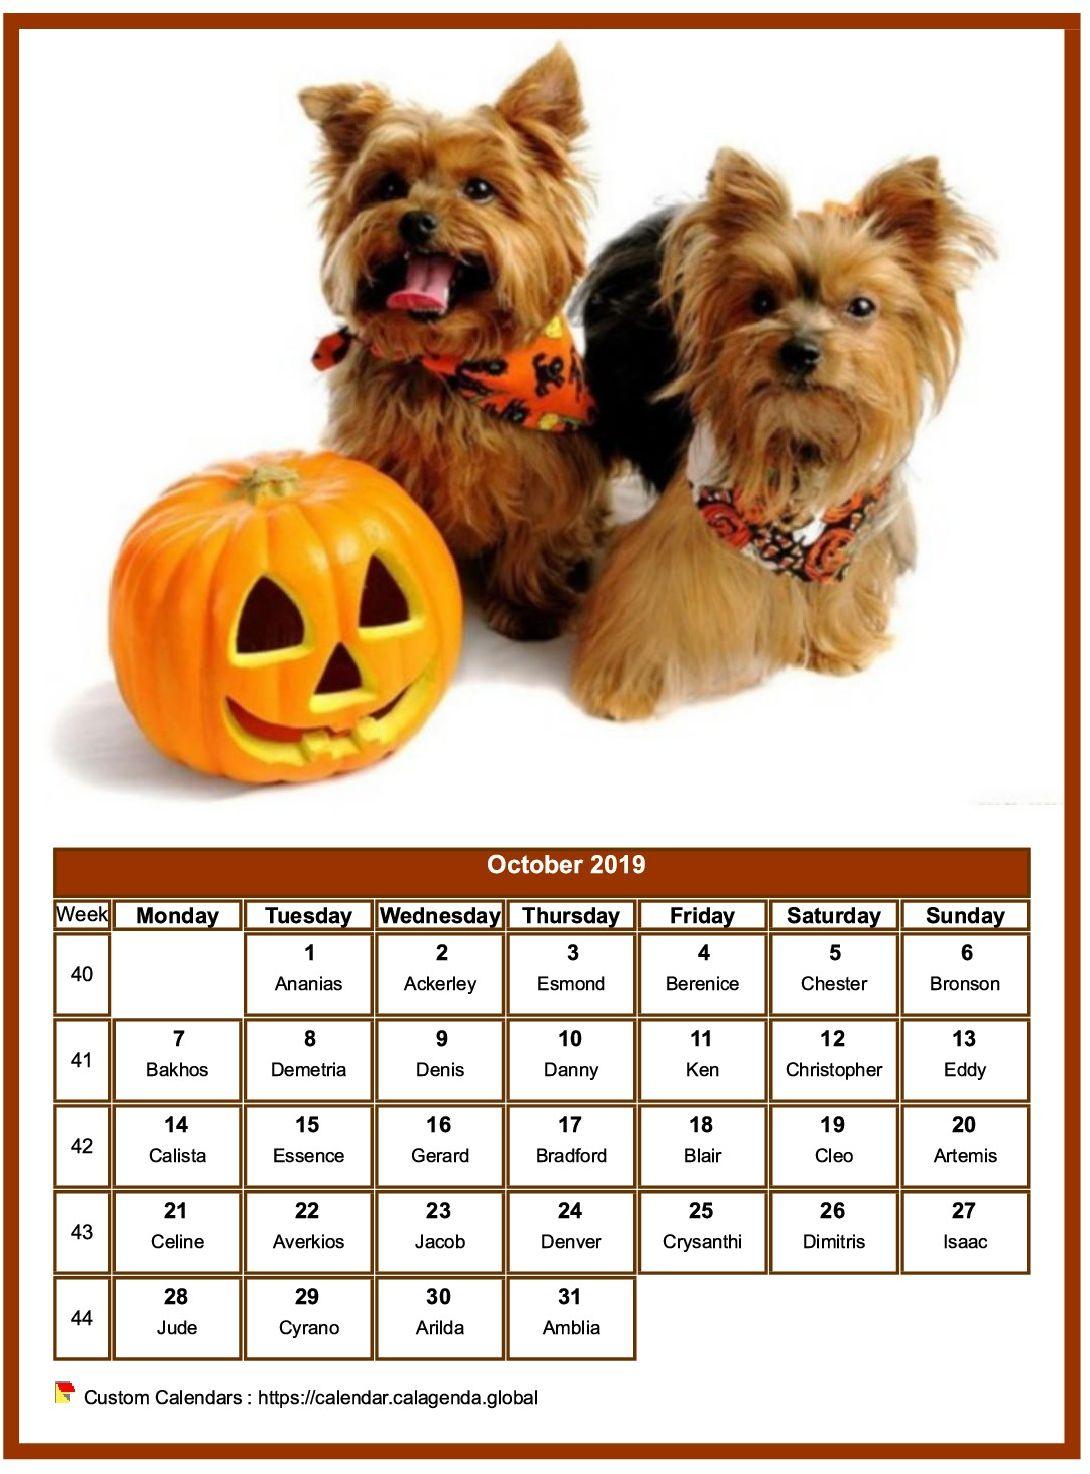 Calendar october 2019 dogs